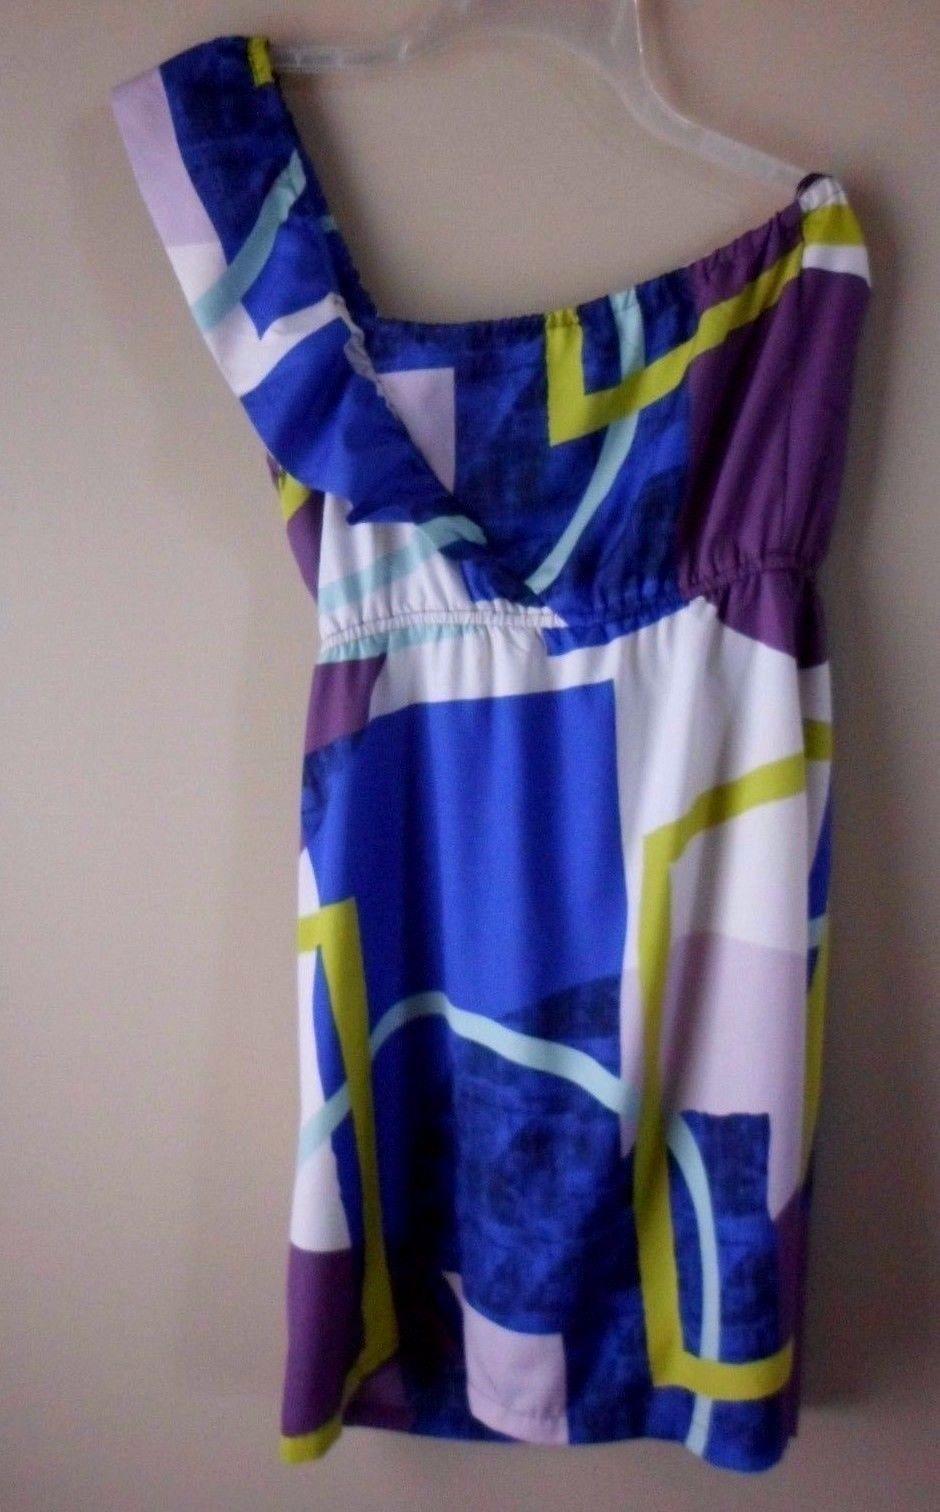 b91cffc9e5 Roxy Dress Blue Purple White Size Medium and 26 similar items